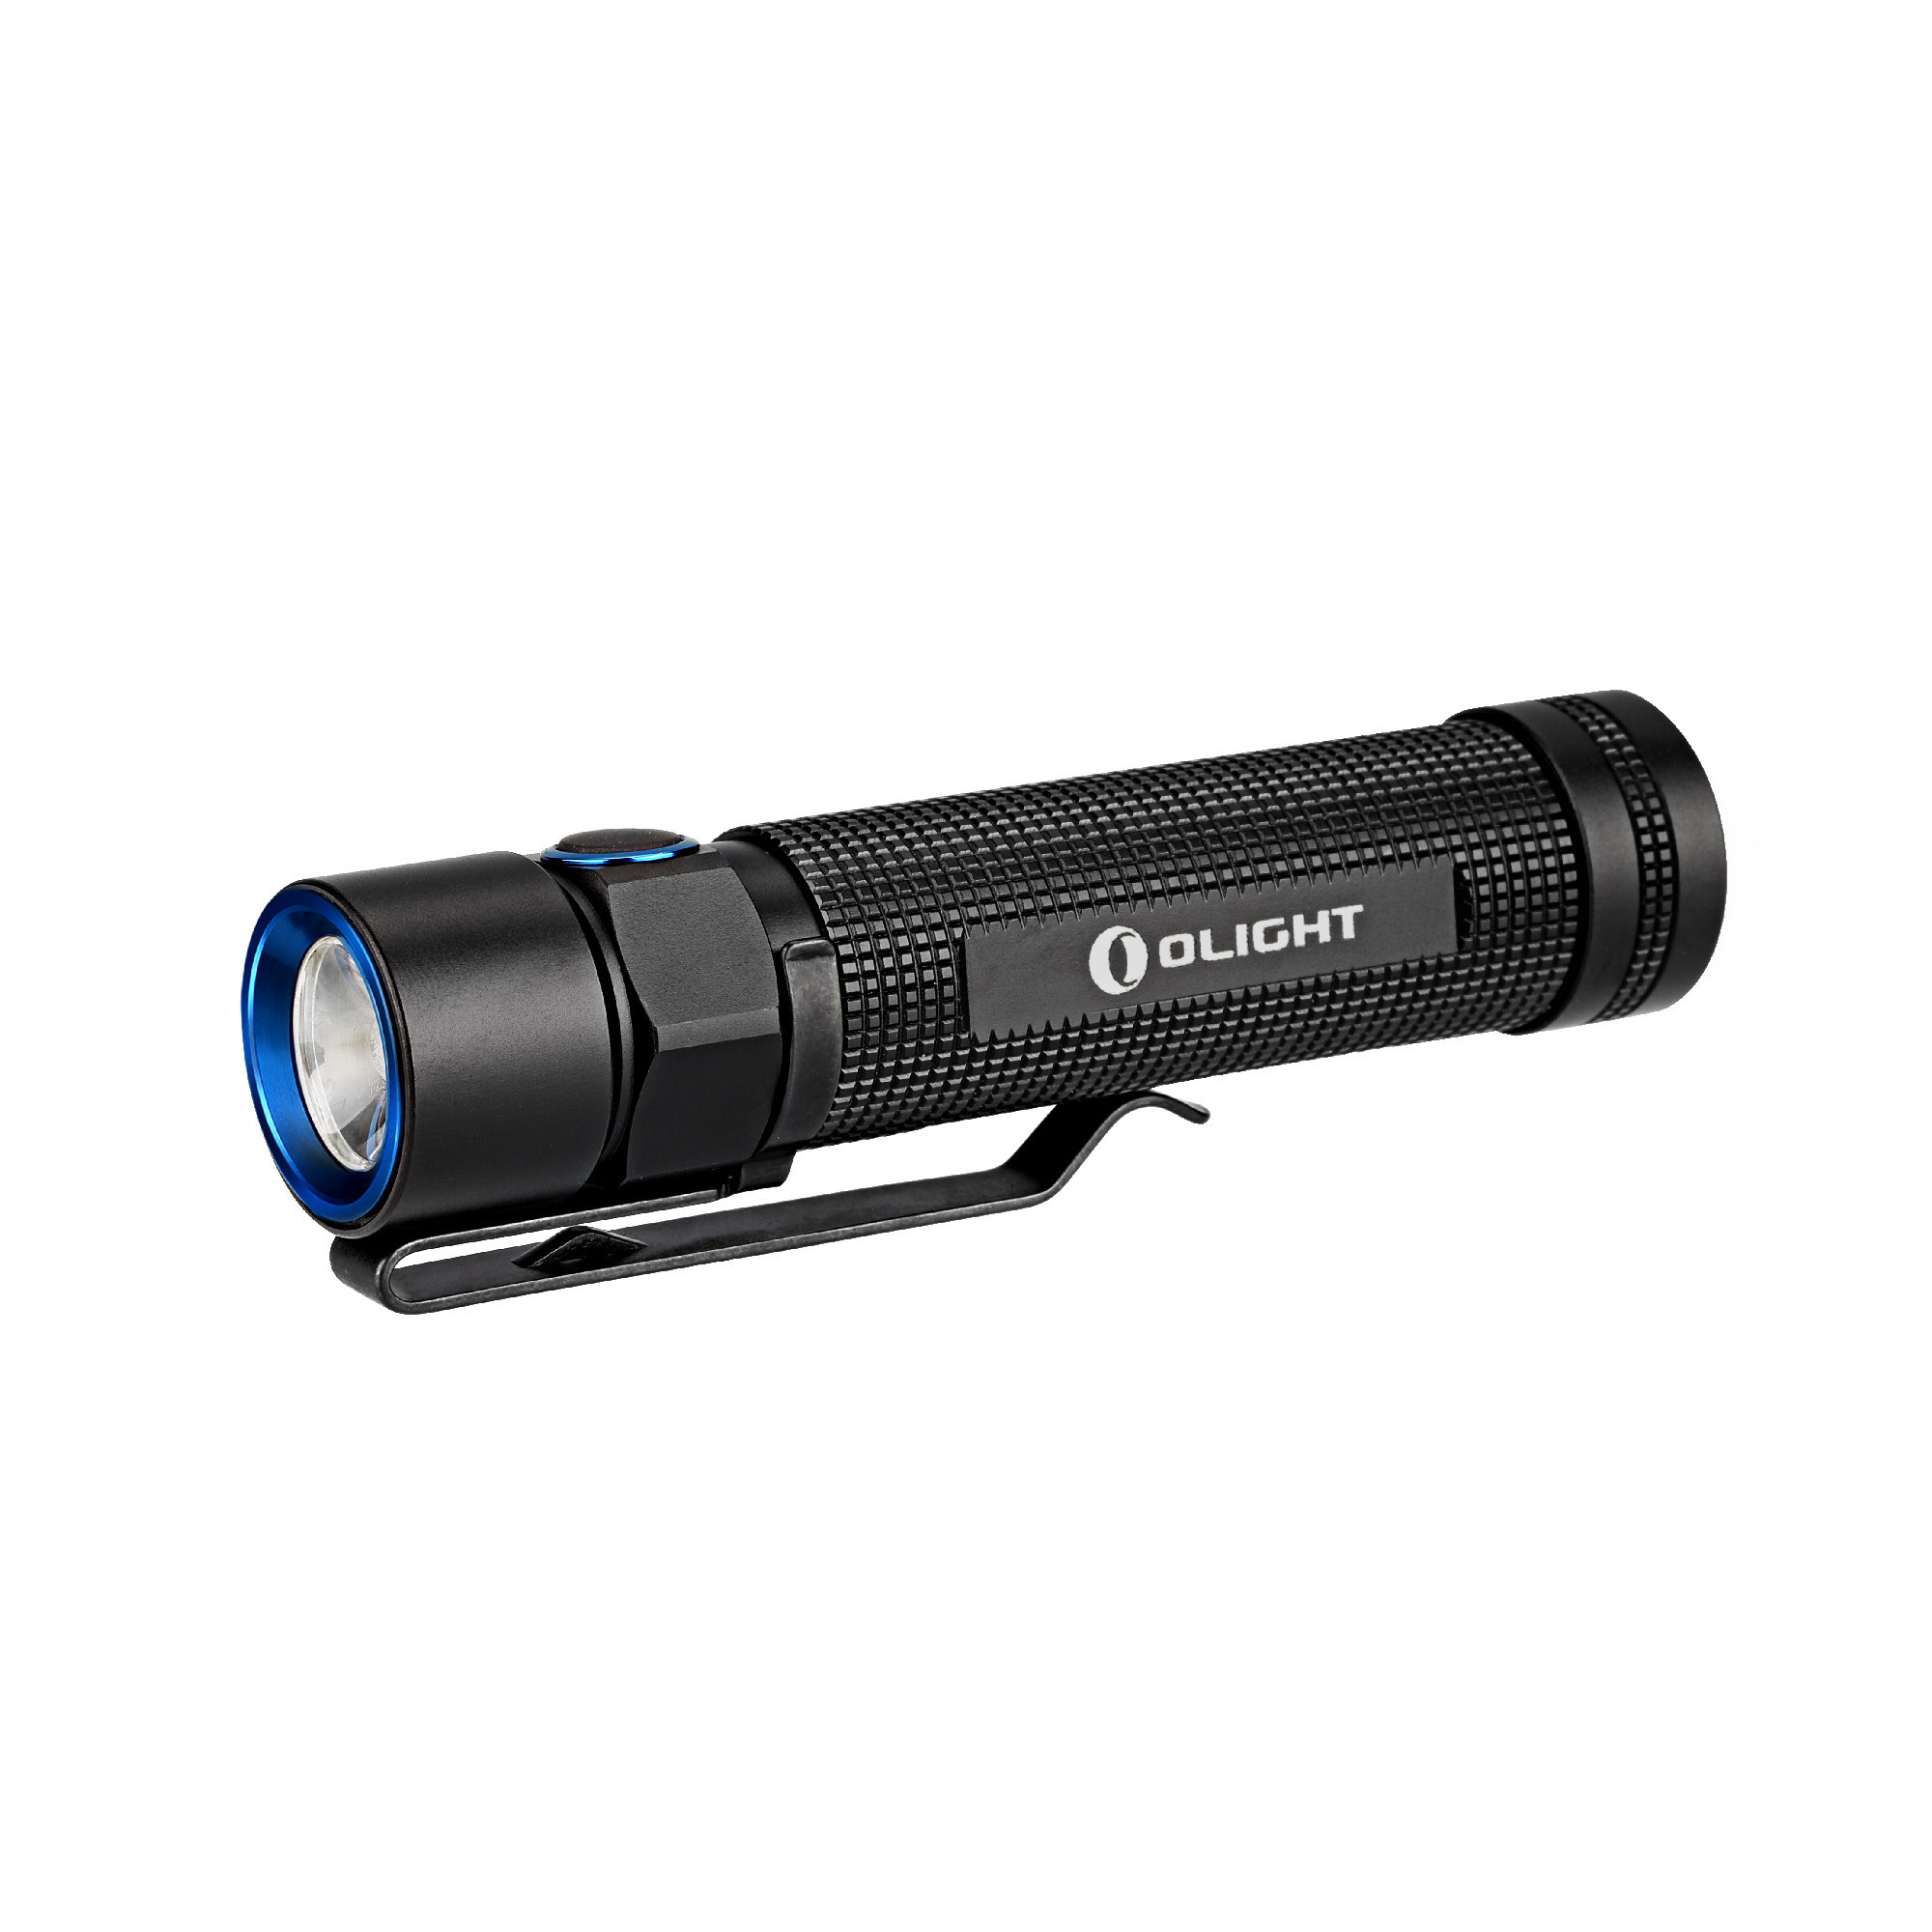 Фонарь Olight S2 Baton everbrite baseball bat led flashlight 2000 lumens baton torch light for self defense security cam e011030ae